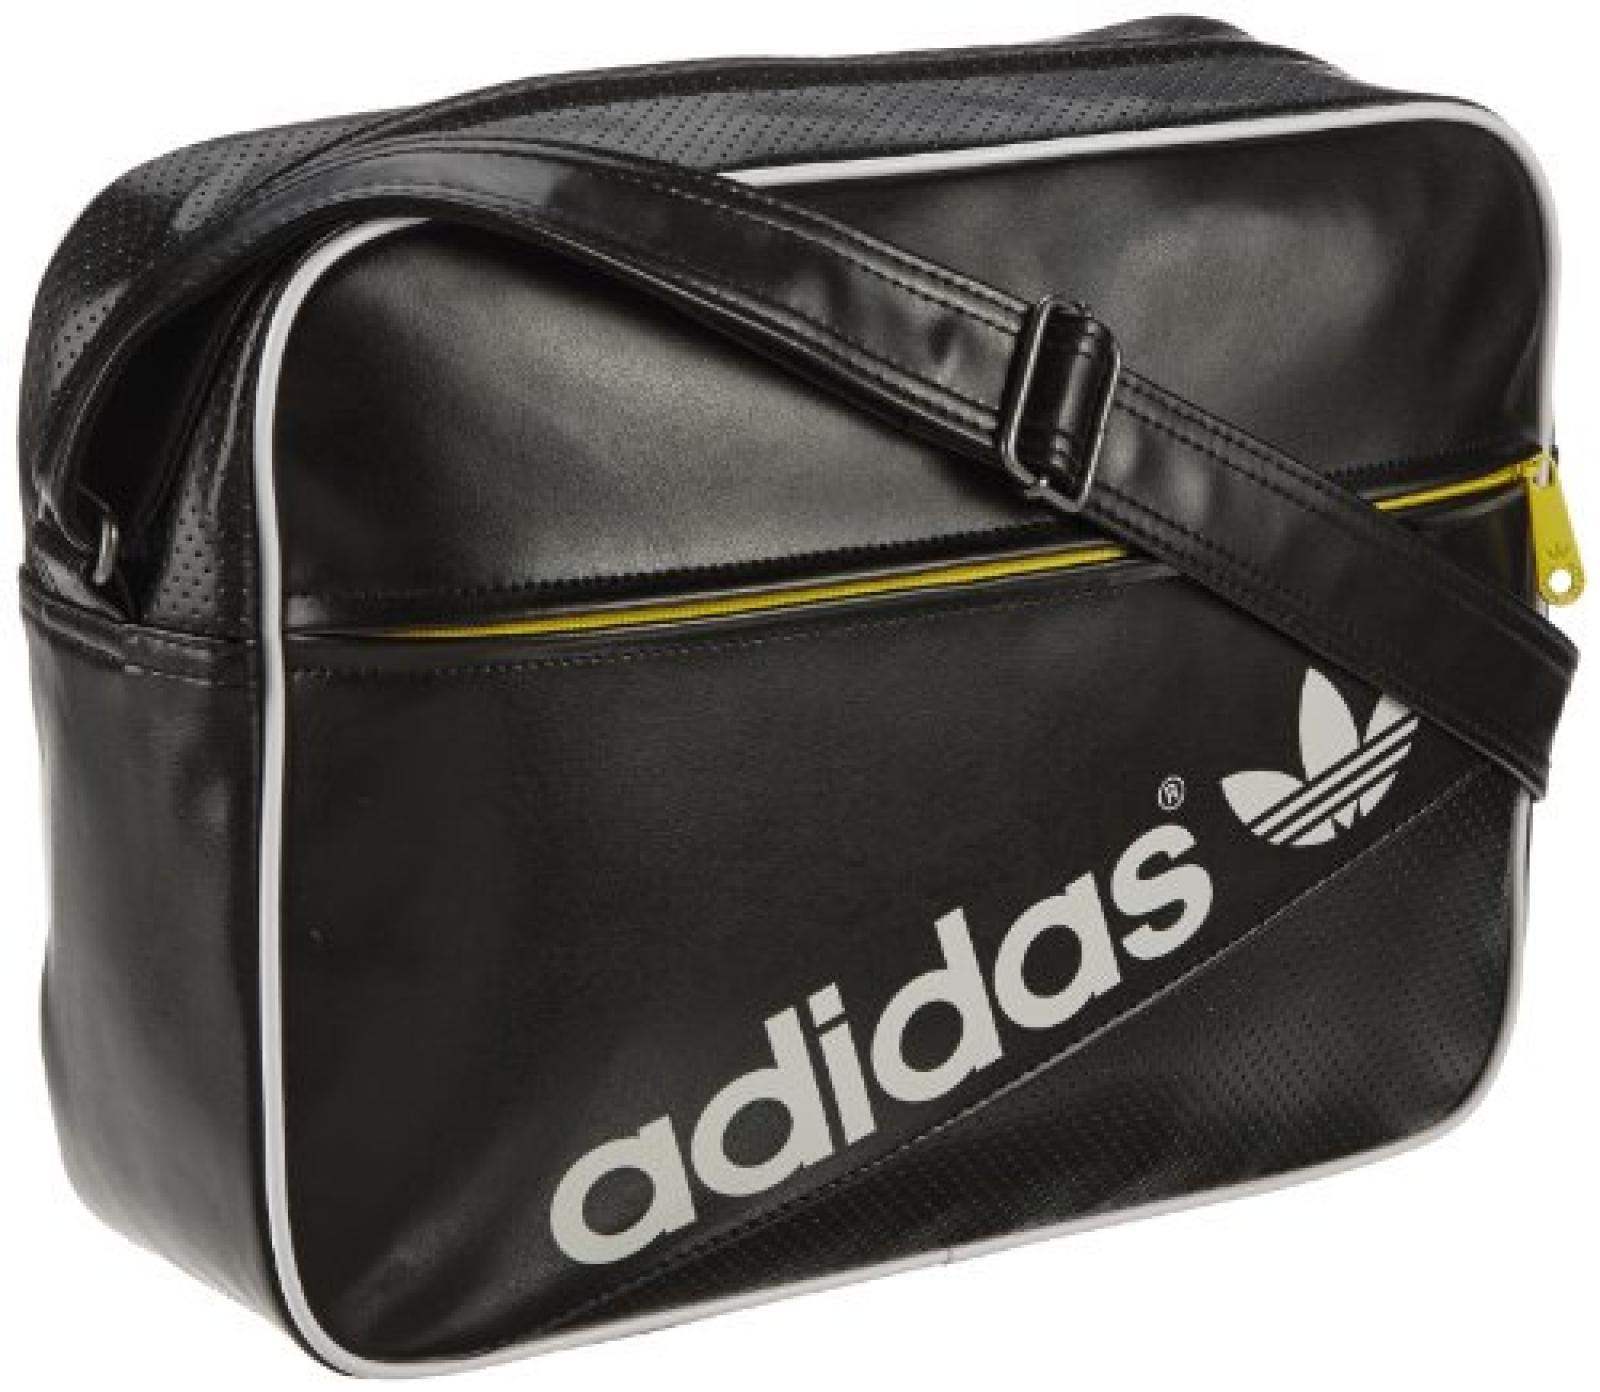 adidas Umhängetasche Airline Bag Perforated